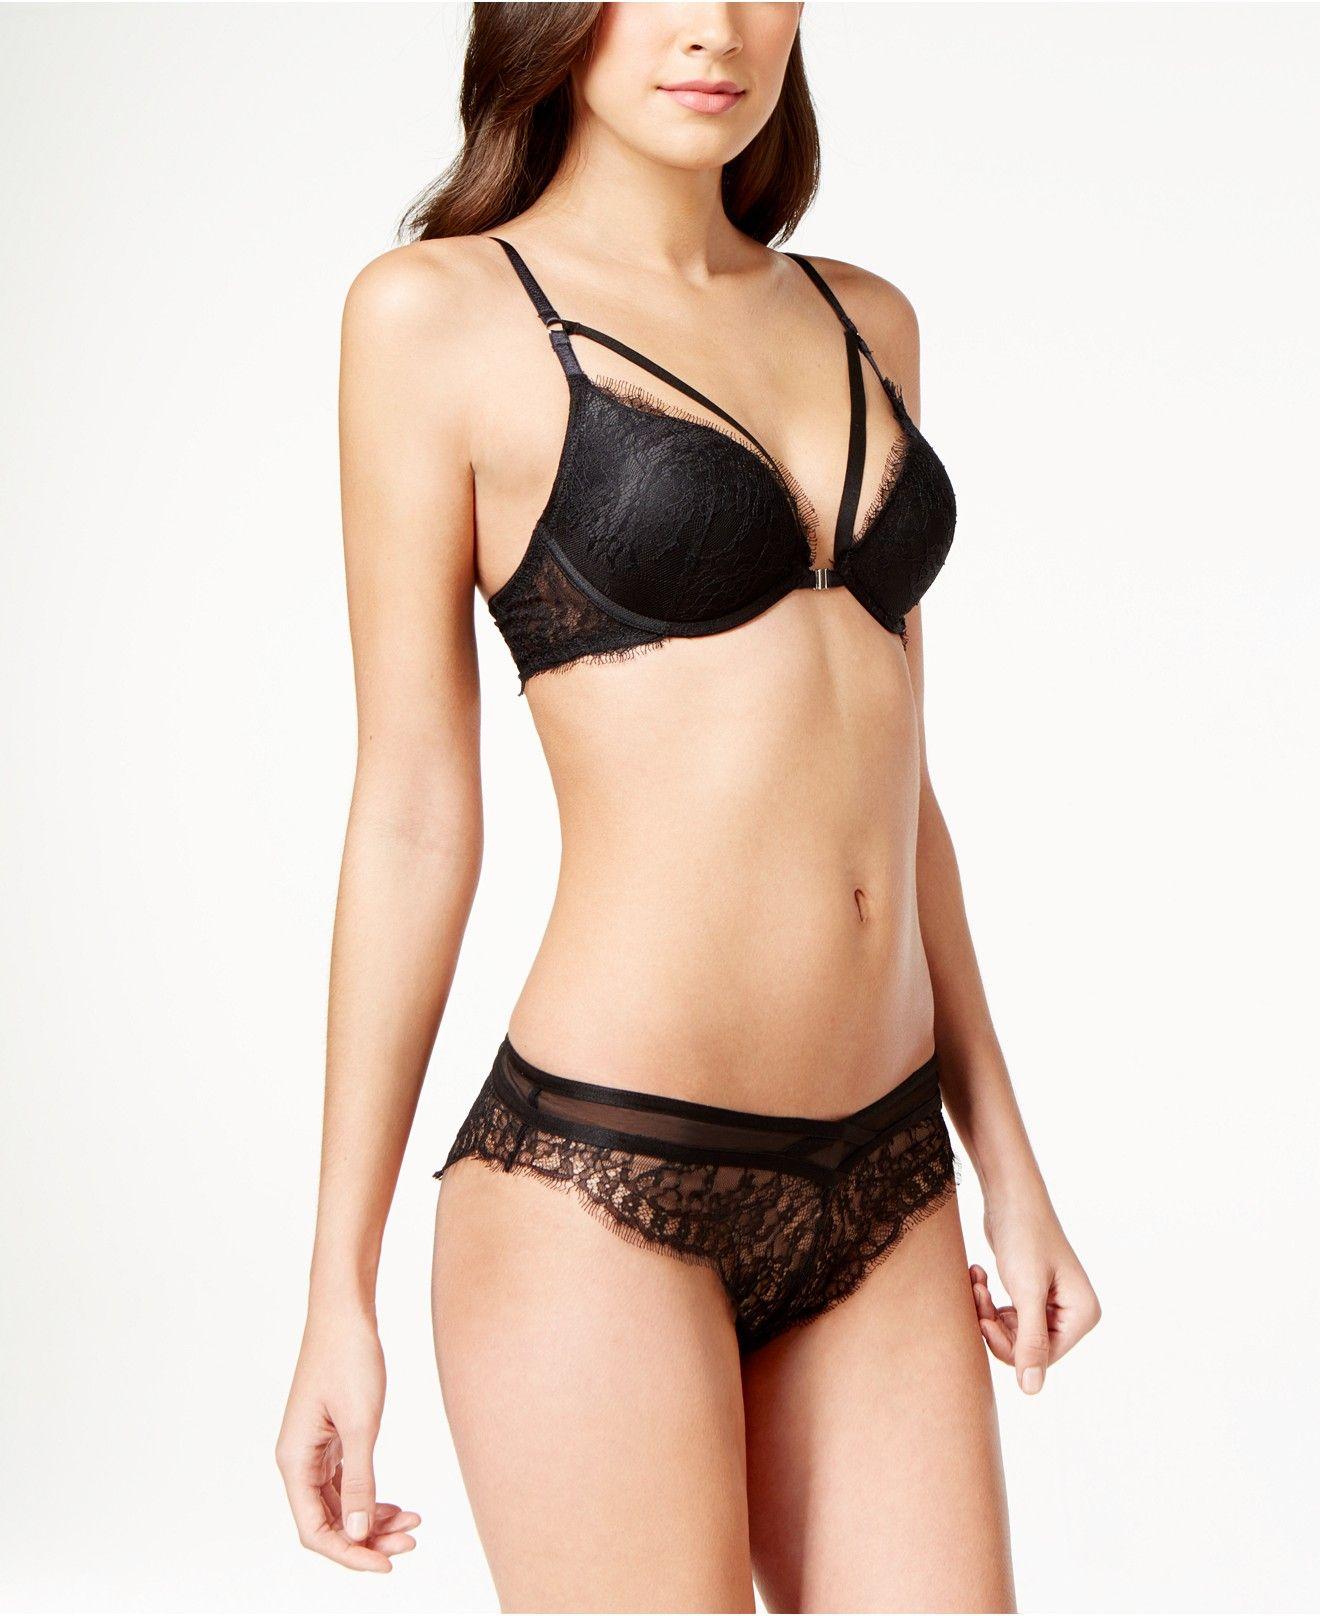 Macys sexy lingerie